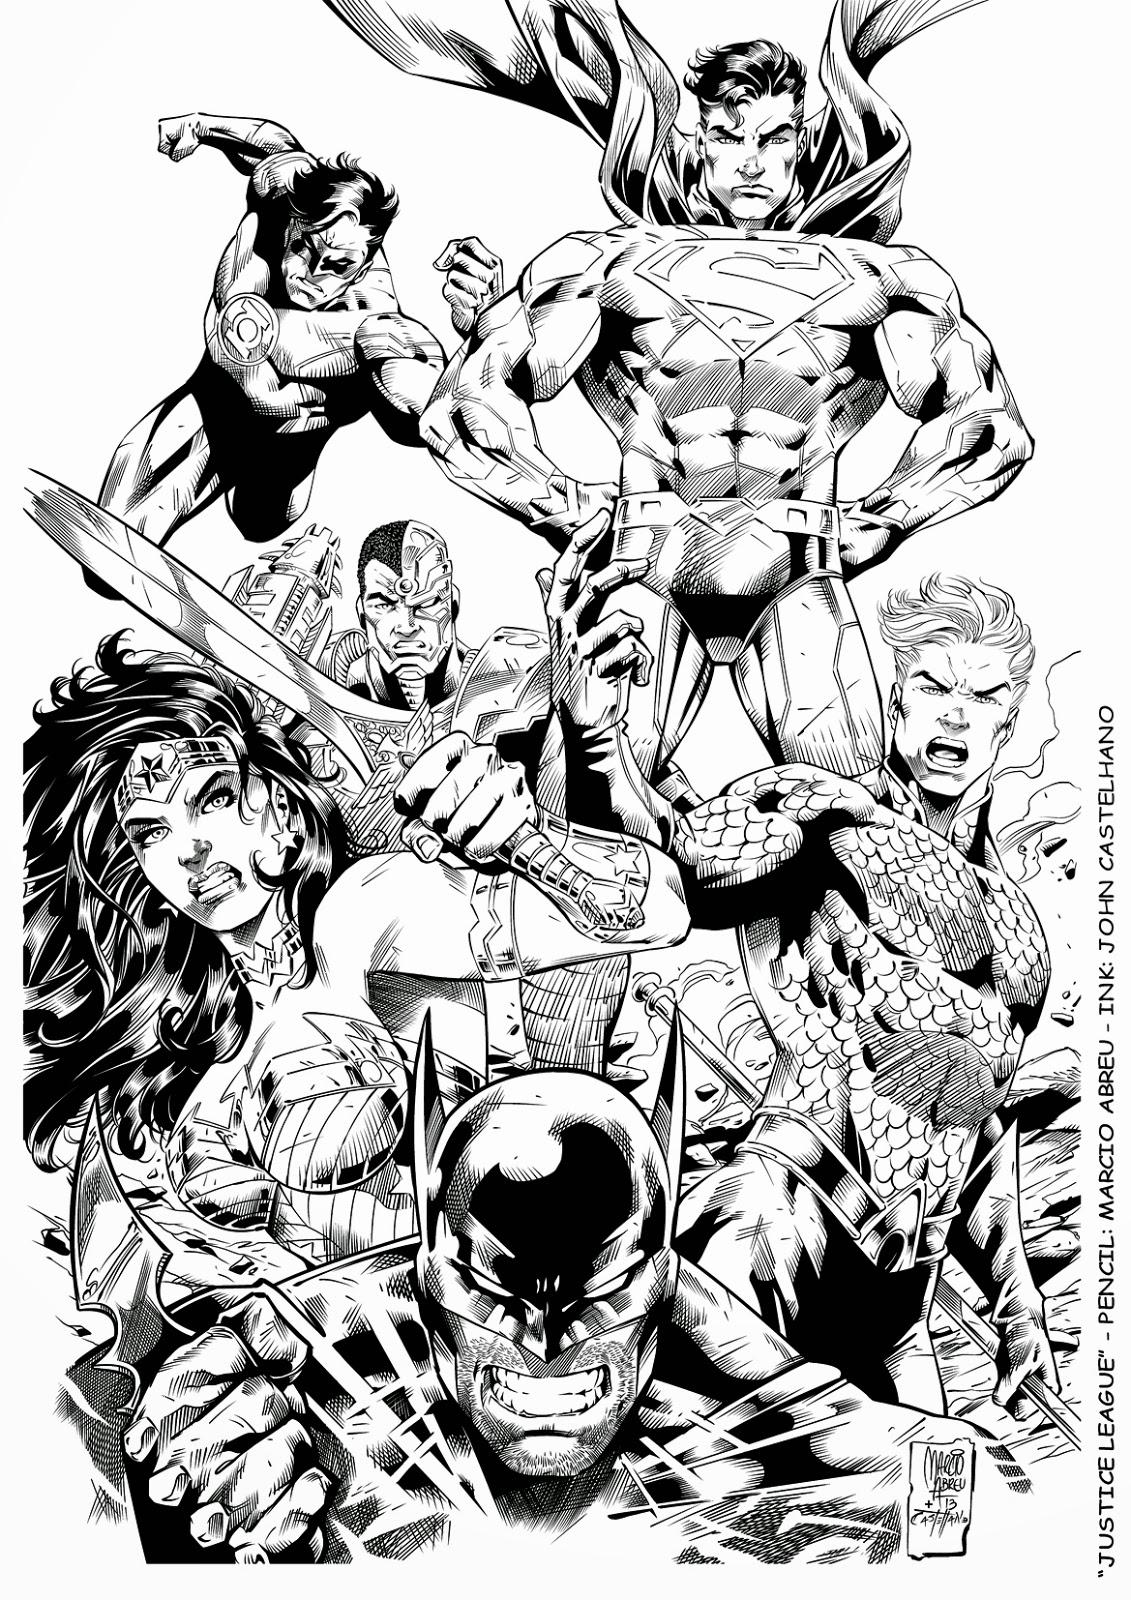 Justice League -Desenho (Pencil): Marcio Abreu - Arte-final (Ink): John Castelhano